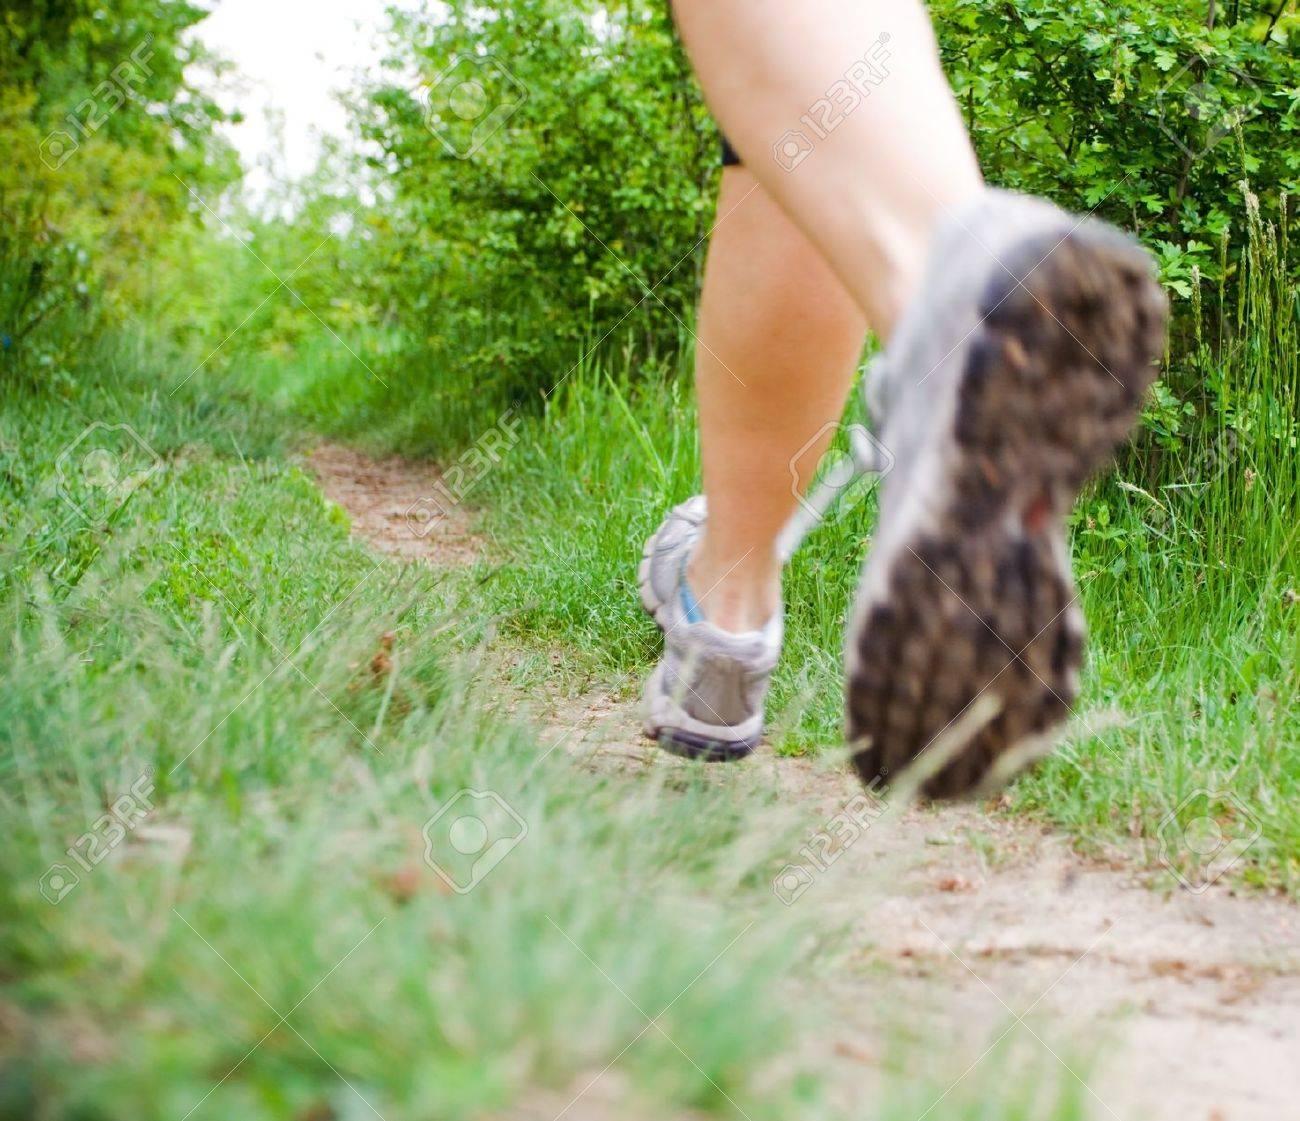 La Sportiva Crosslite Fell Shoes | Northern Runner